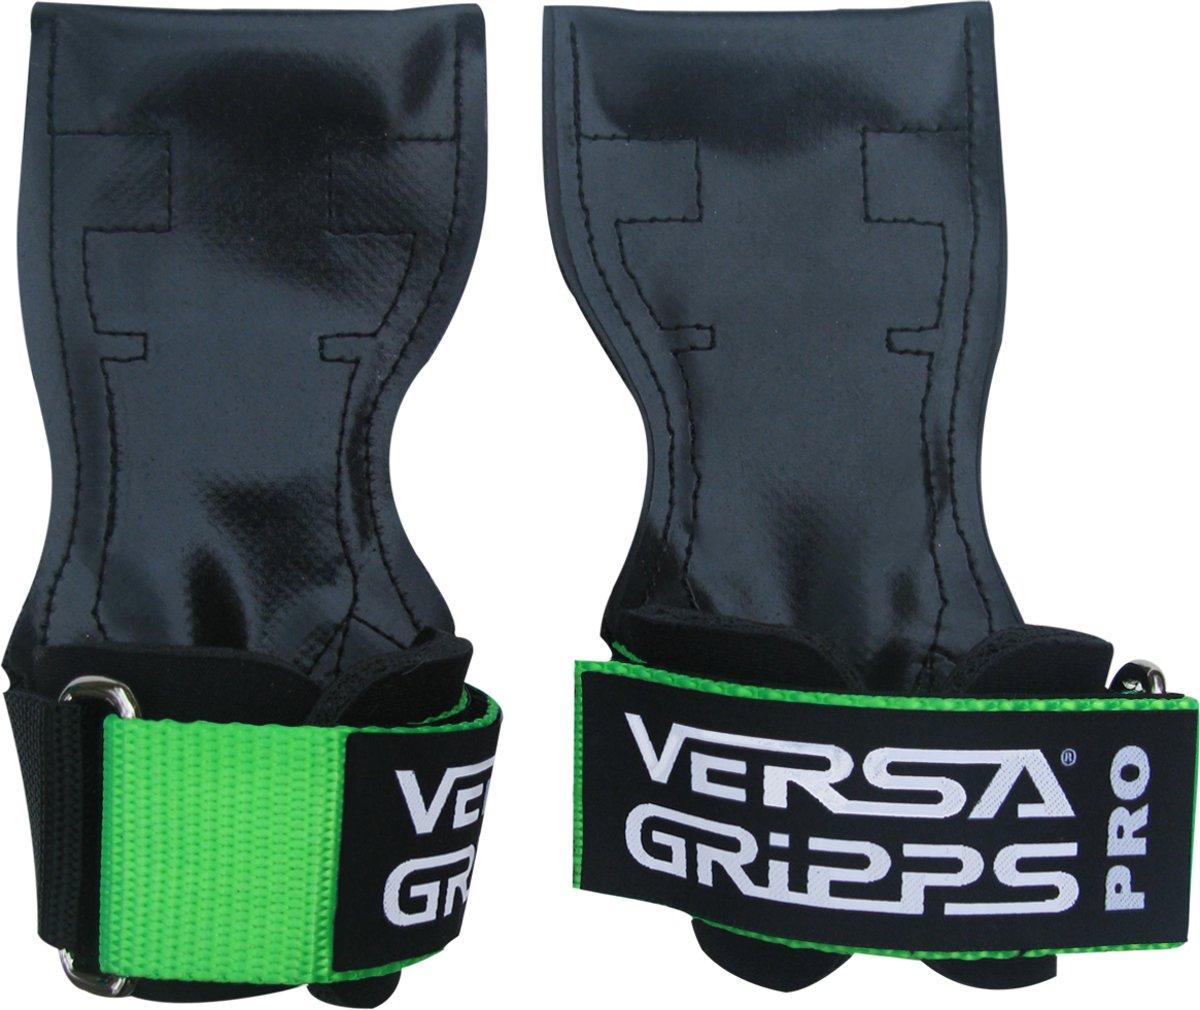 Versa Gripps PRO Limited Edition - Lime Green kopen